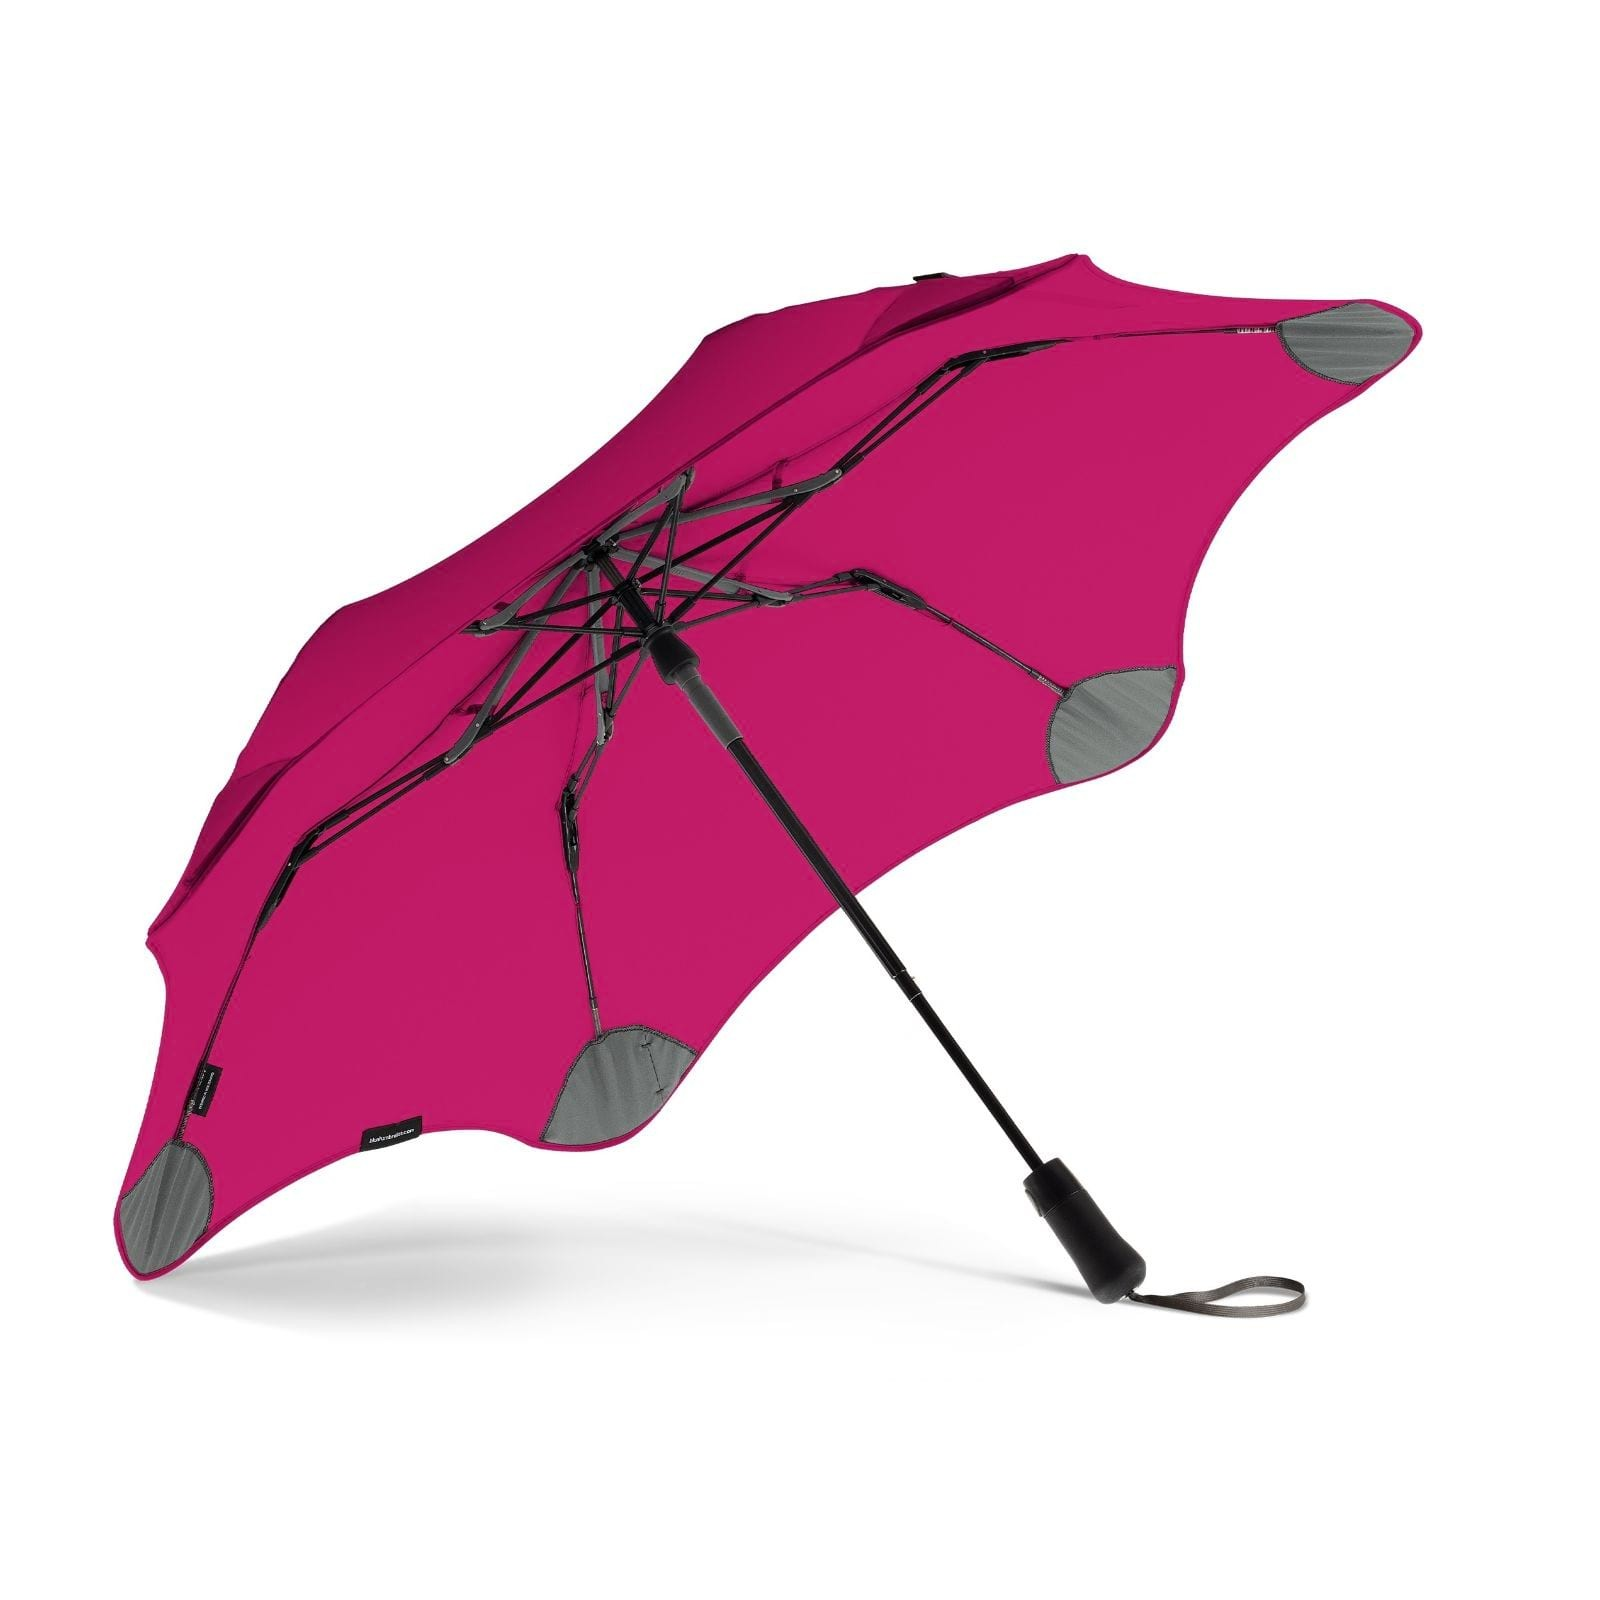 Metro Automatic Storm Umbrella (Pink) - Blunt